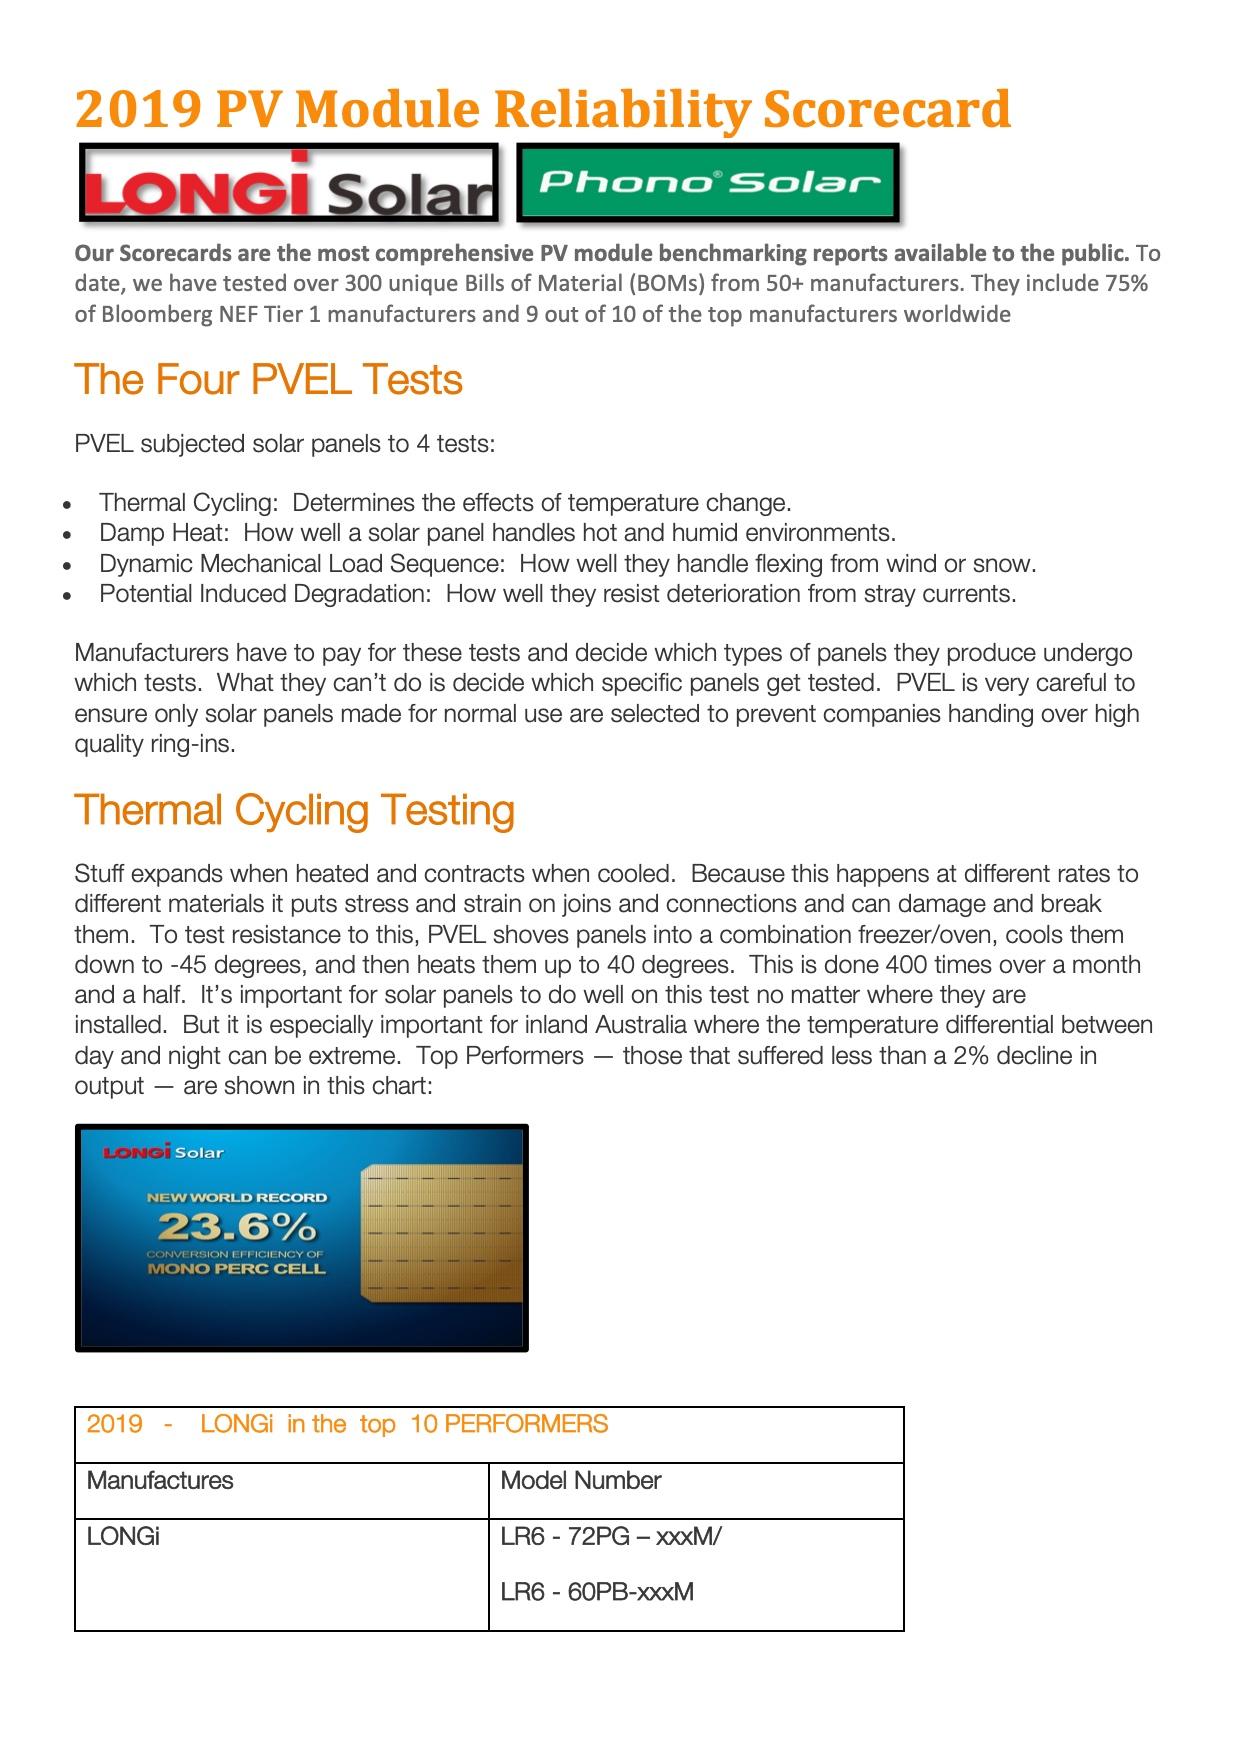 2019 PV Module Reliability Scorecard